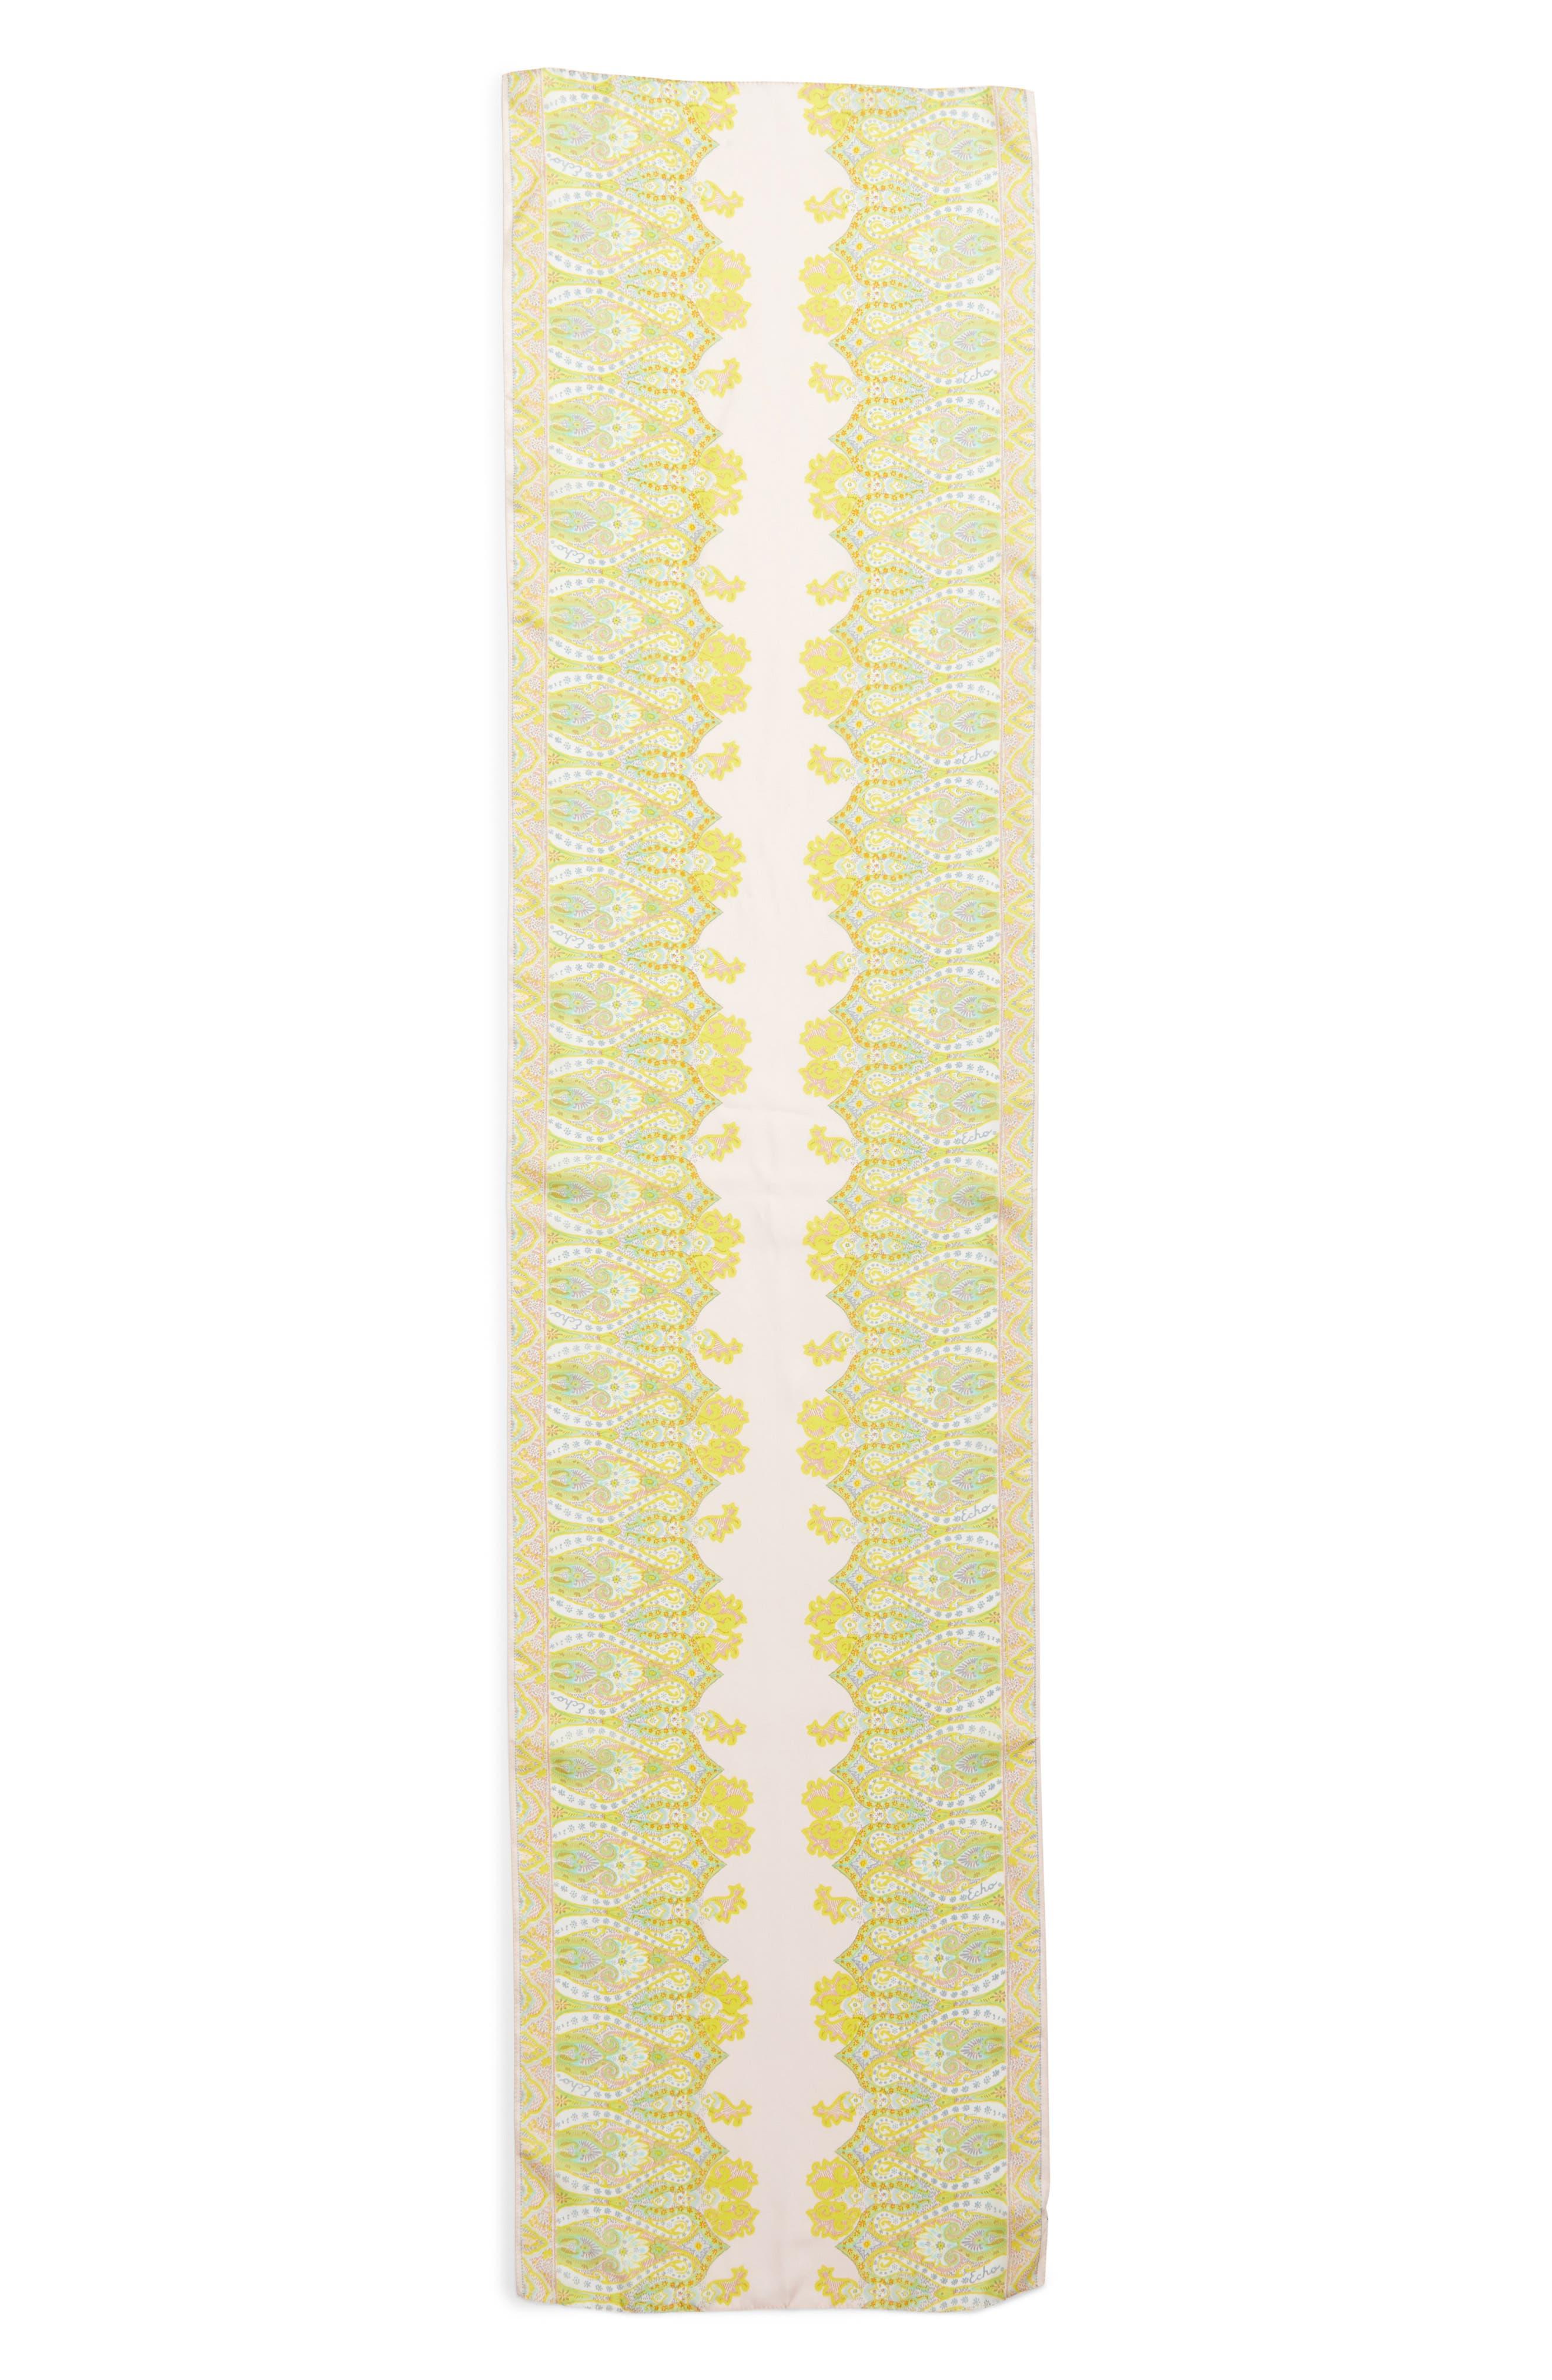 Sea Fan Paisley Silk Scarf,                             Alternate thumbnail 3, color,                             Pearl Pink